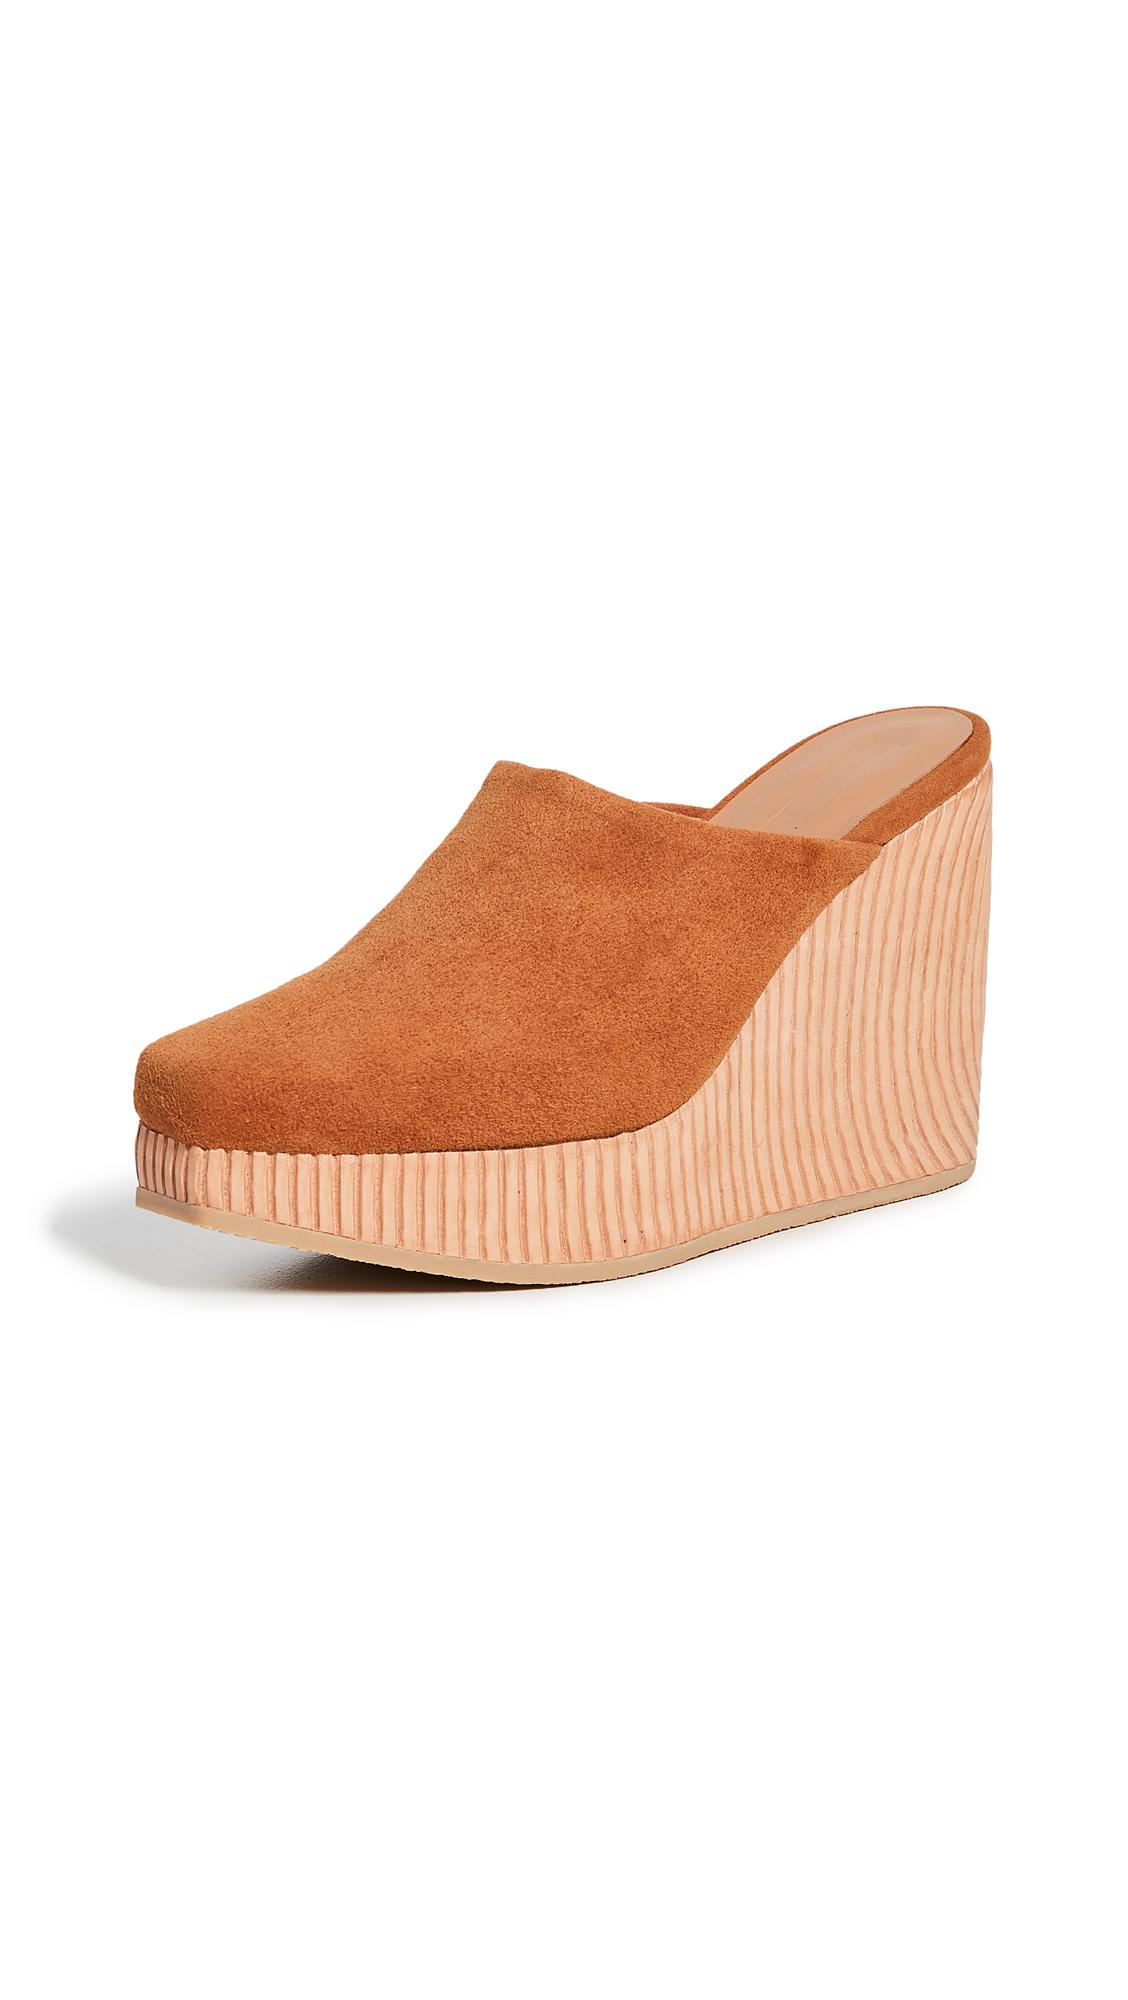 Rachel Comey Thatch Wedge Sandals